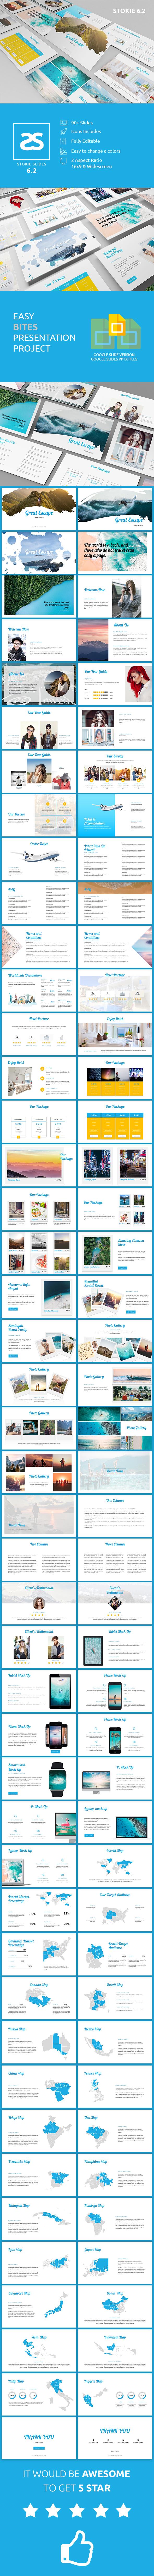 GraphicRiver Travel Agency Google Slide Template 6.2 20860238